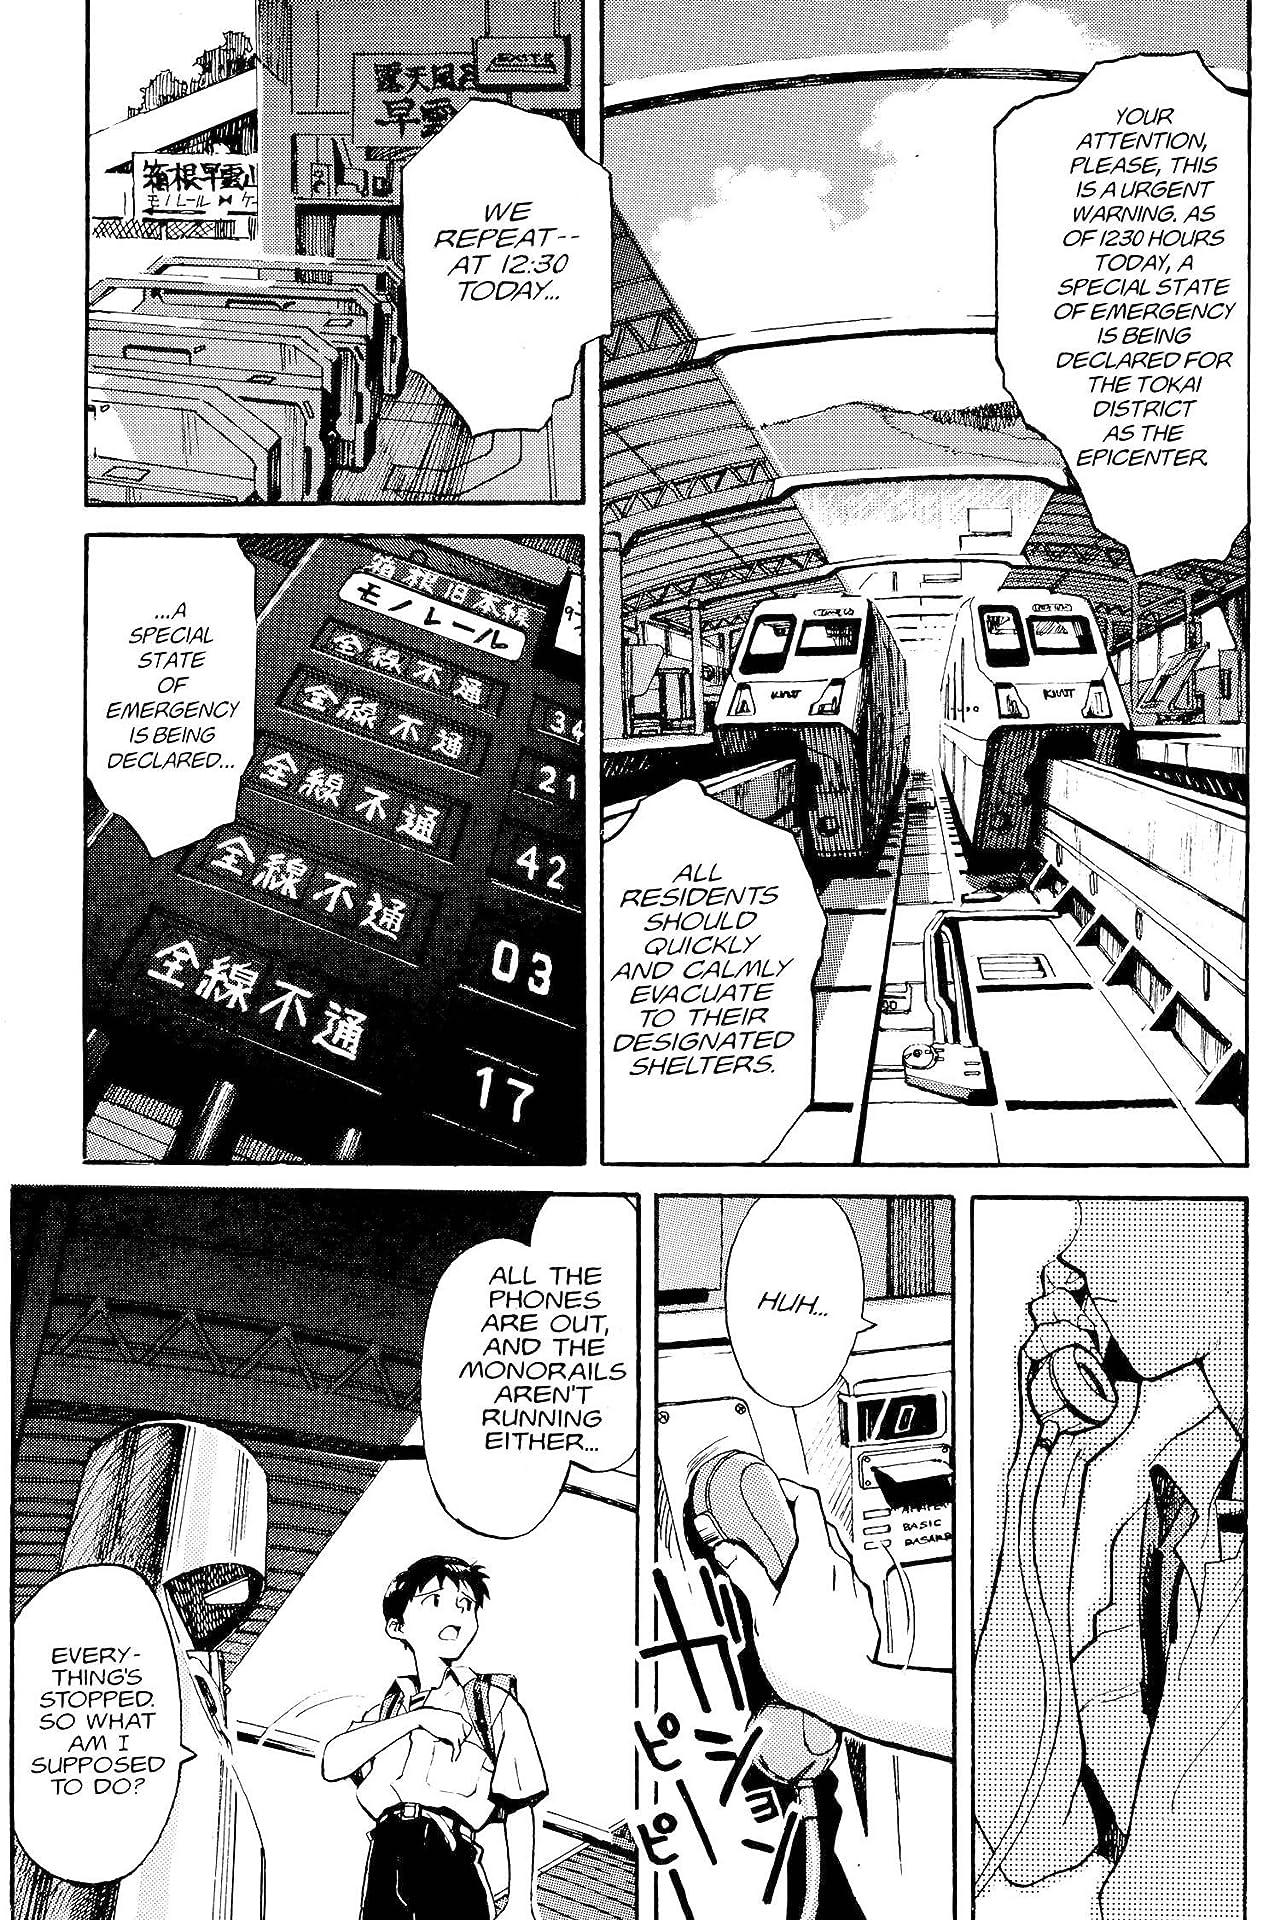 Neon Genesis Evangelion 3-in-1 Edition Vol. 1